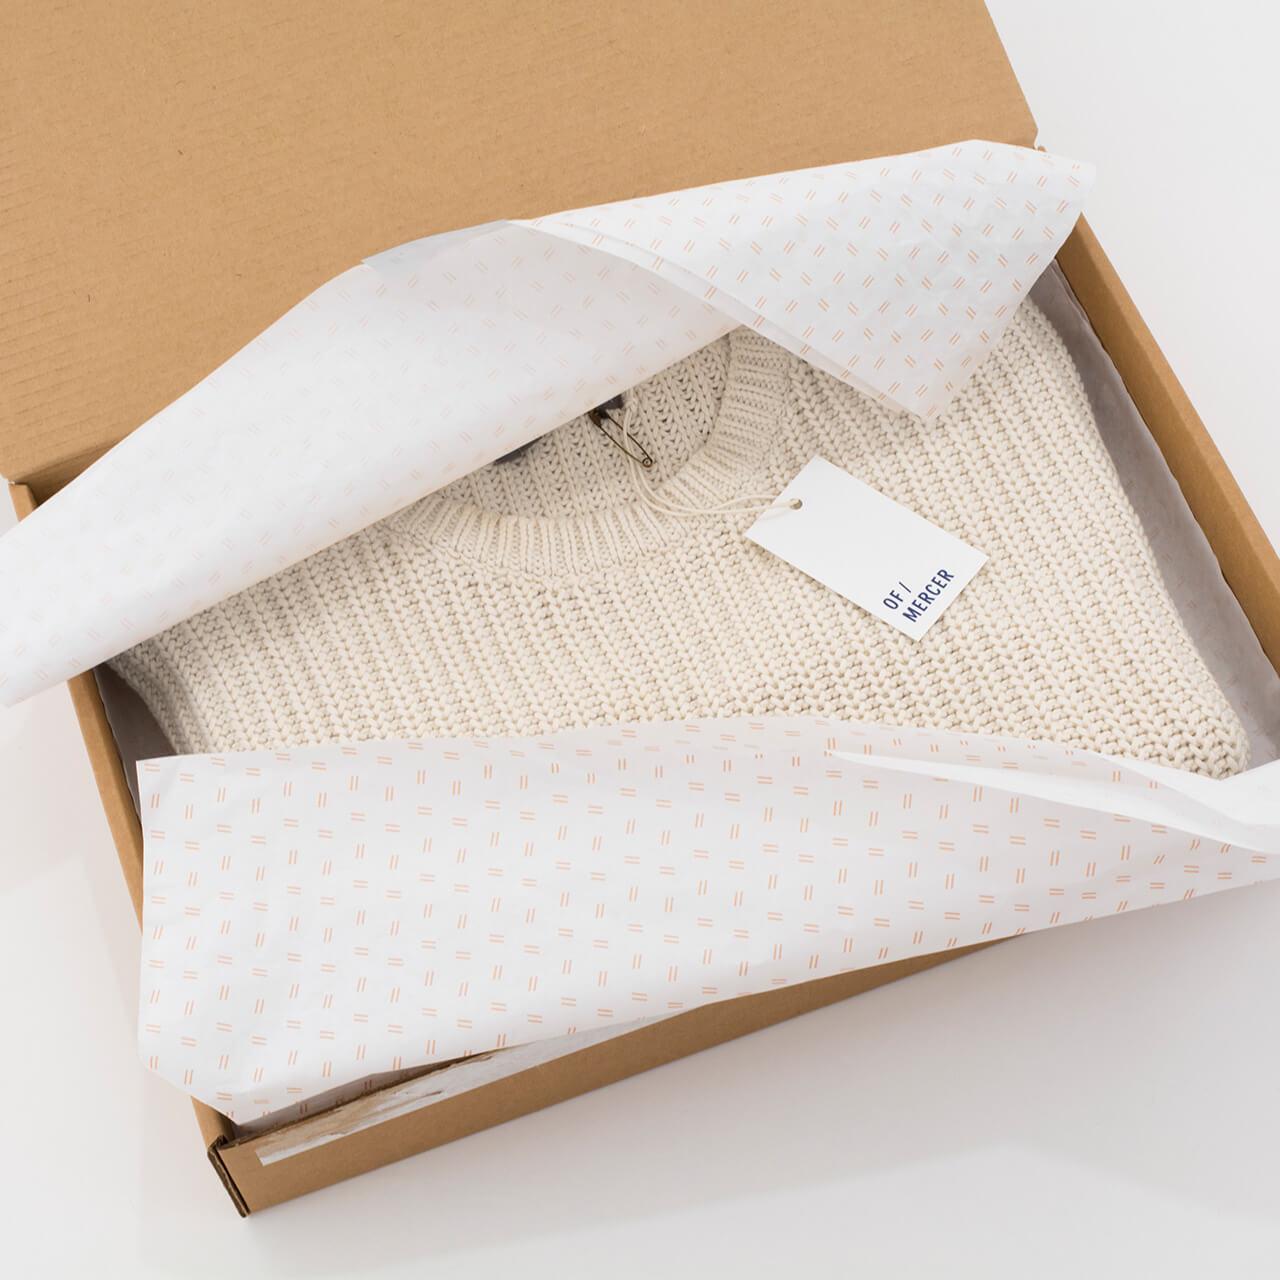 bueno-ofmercer-open-box